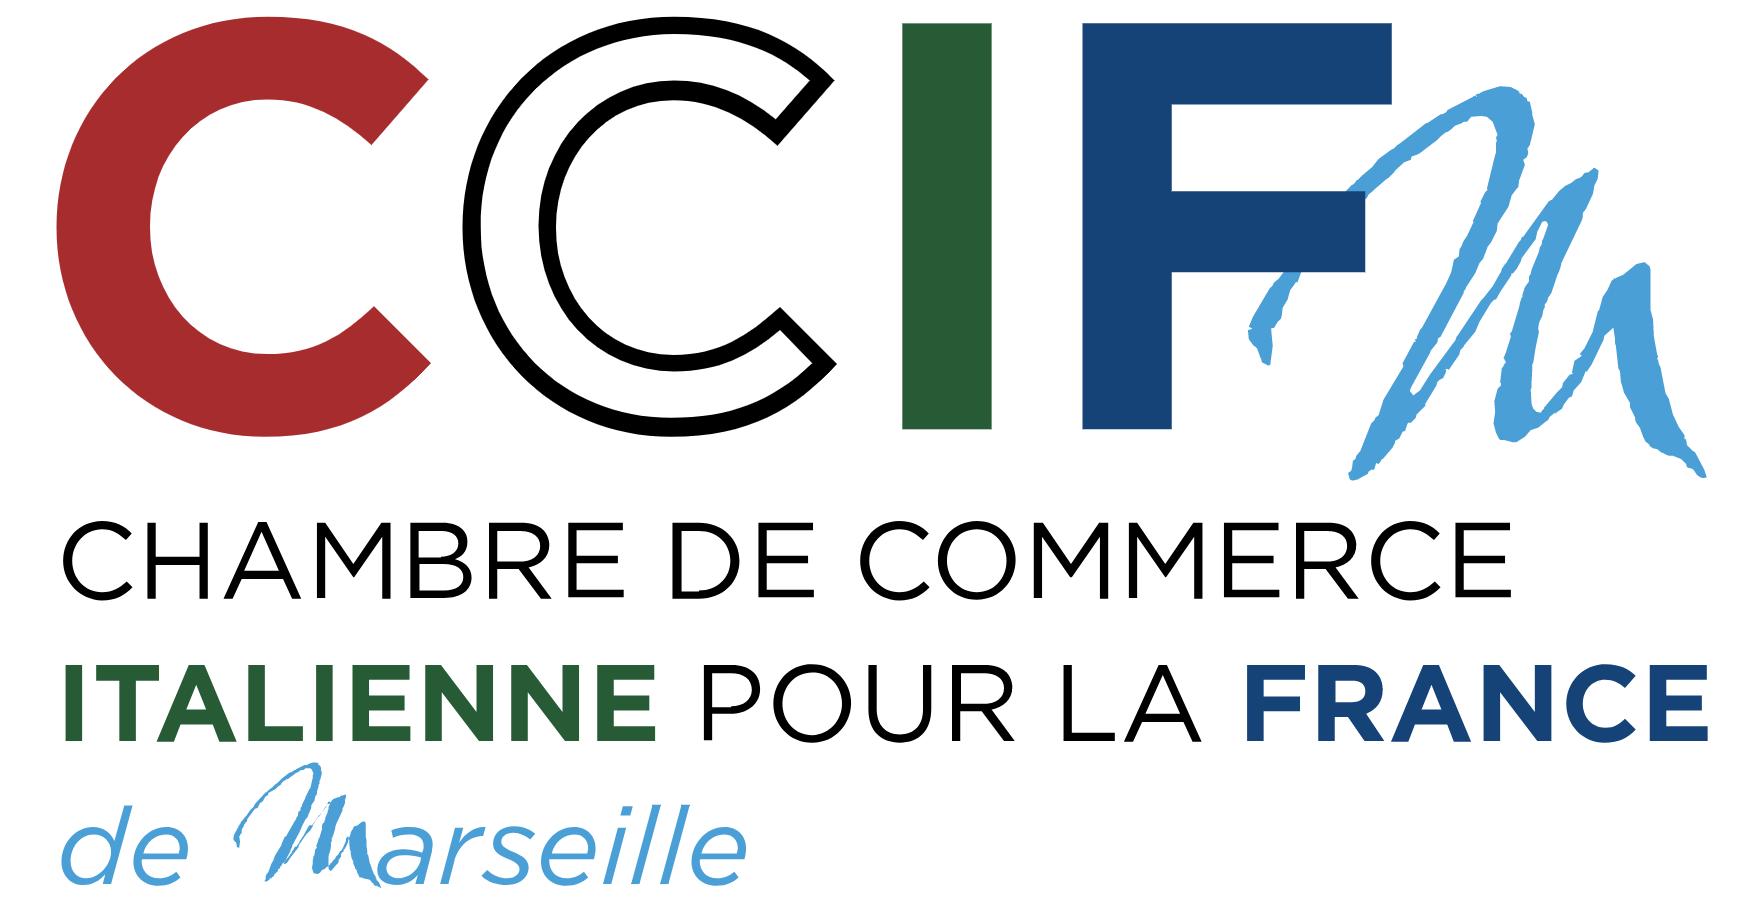 Chambre De Commerce Italienne En France